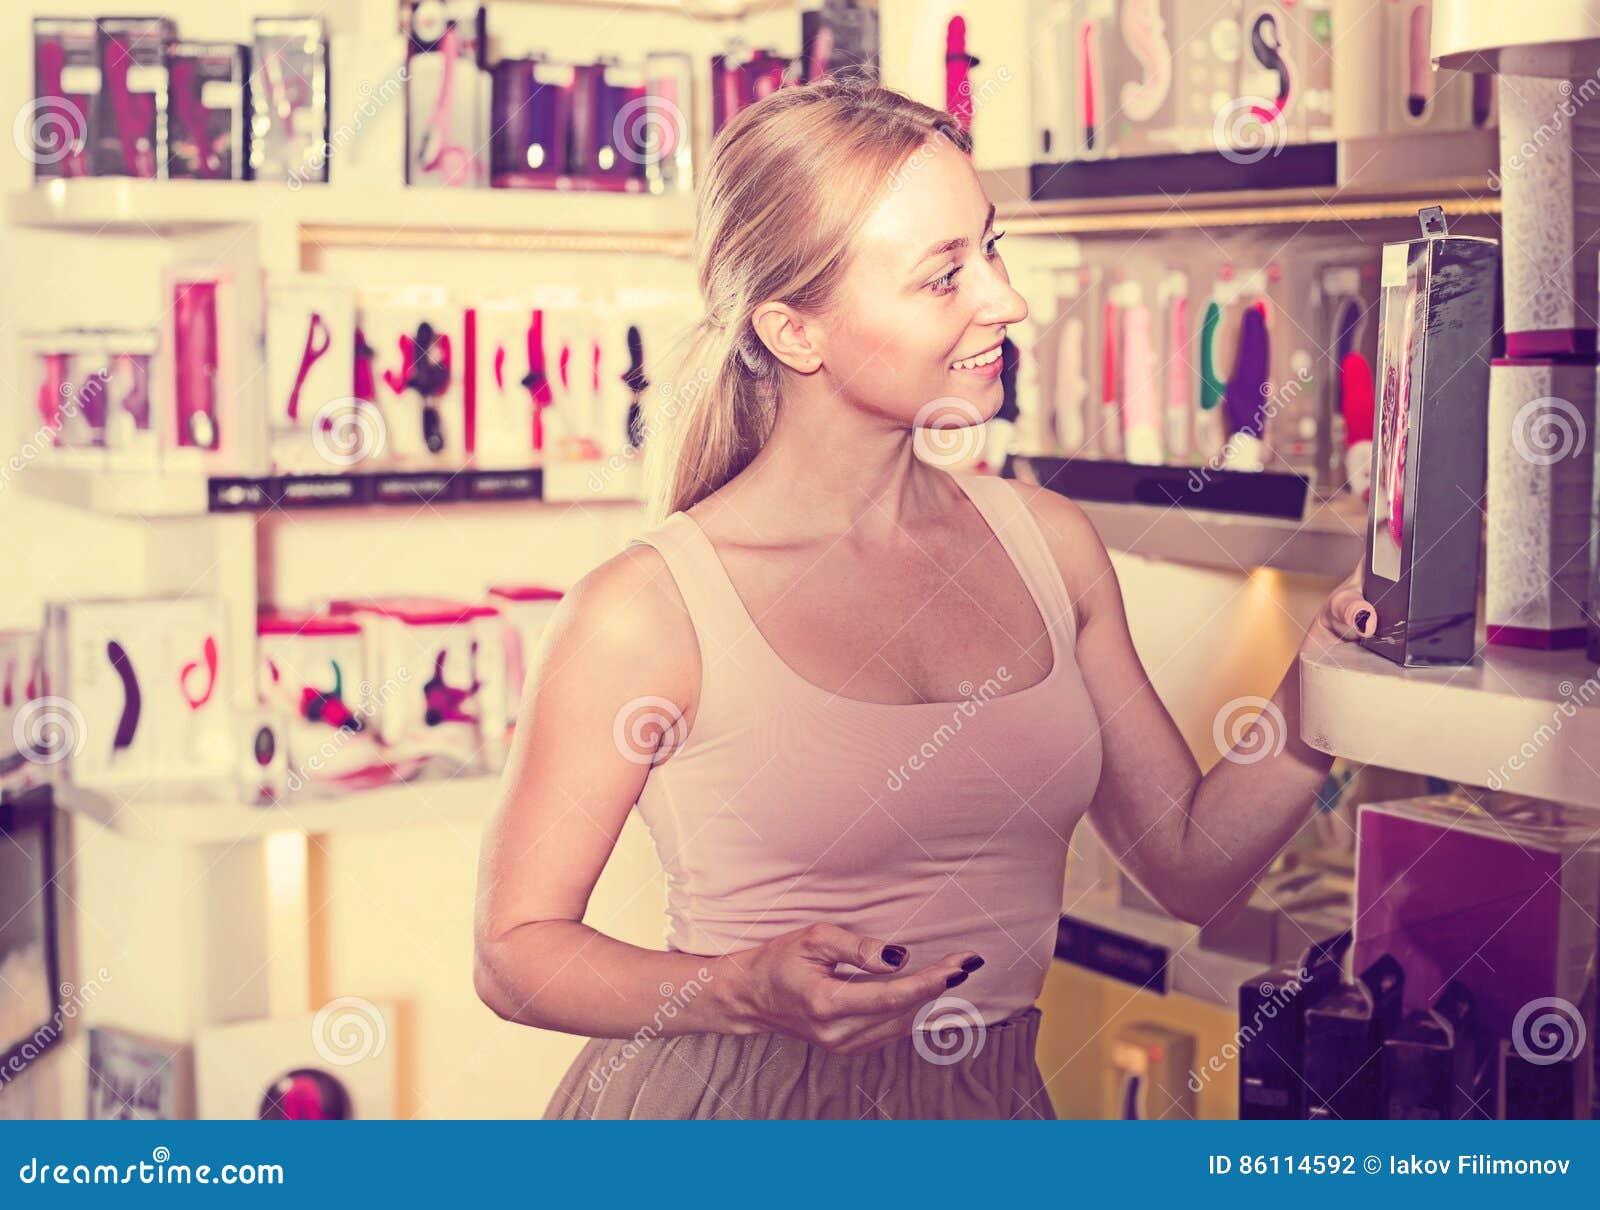 Girls have sex in sex shop